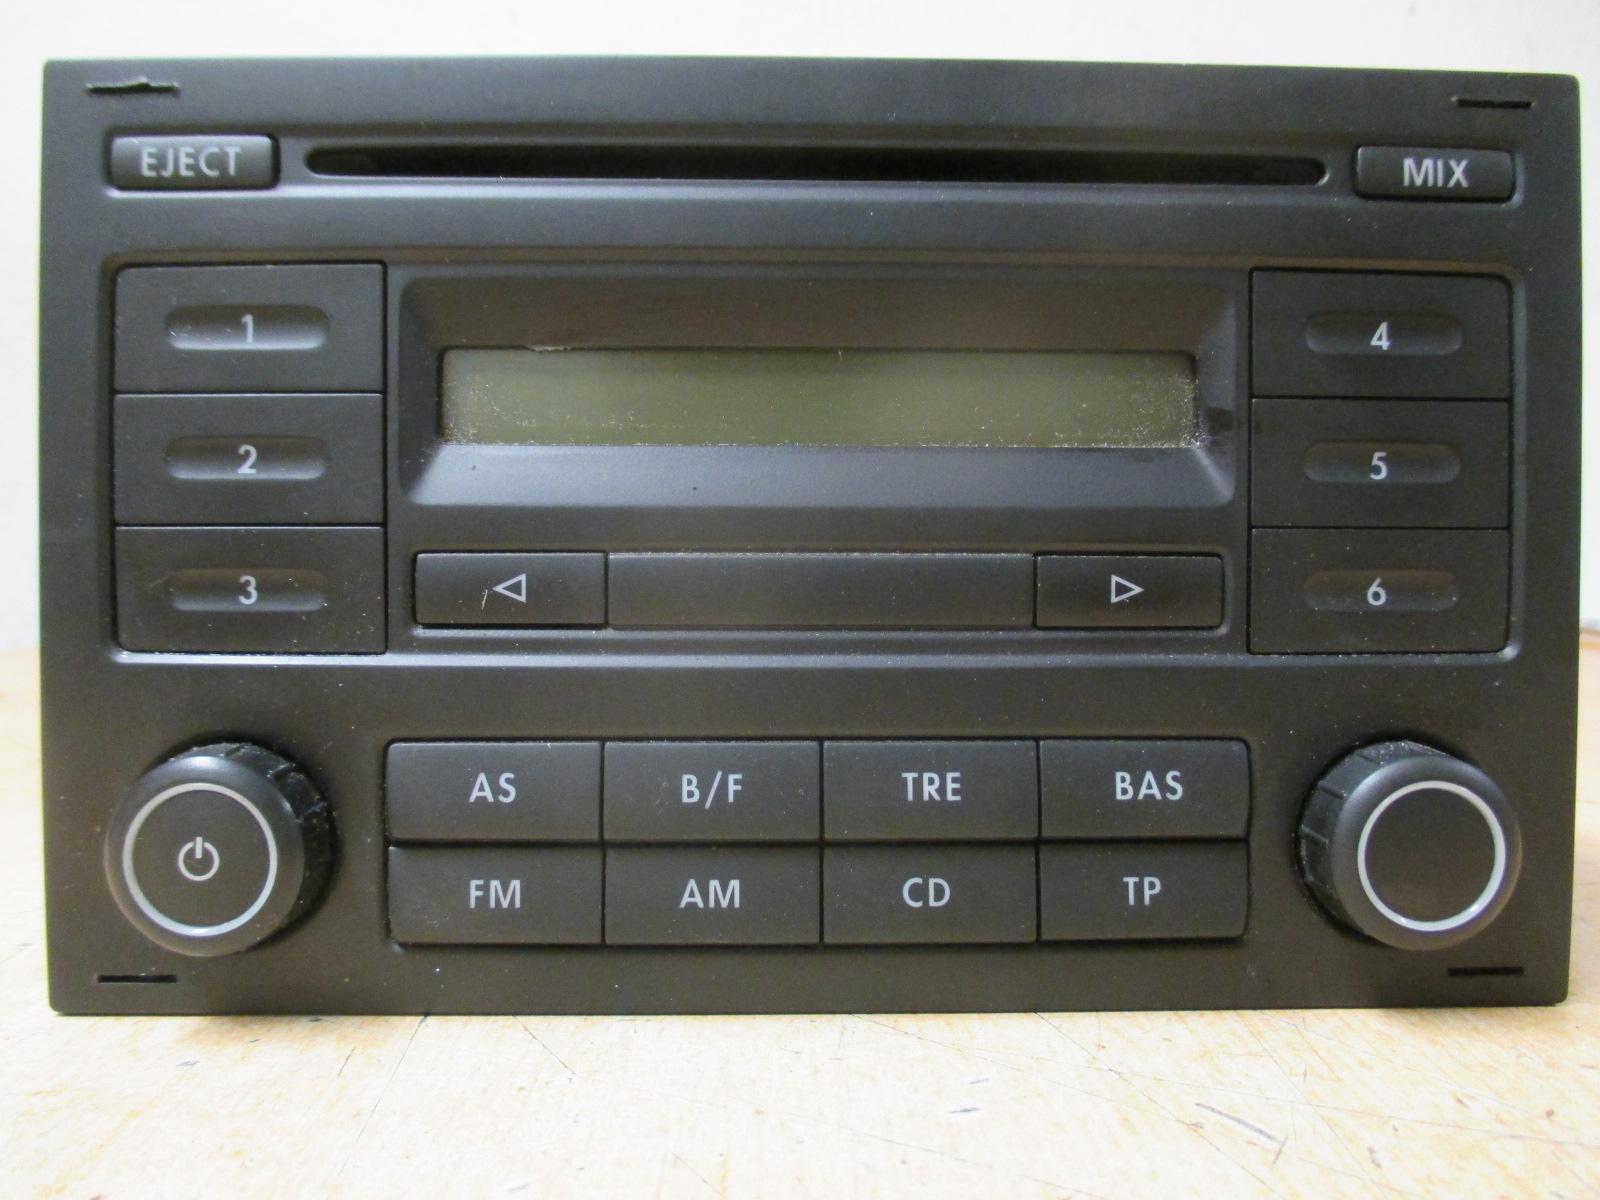 vw polo 9n 1 2 bj 2007 autoradio radio cd 6q00354152c ebay. Black Bedroom Furniture Sets. Home Design Ideas